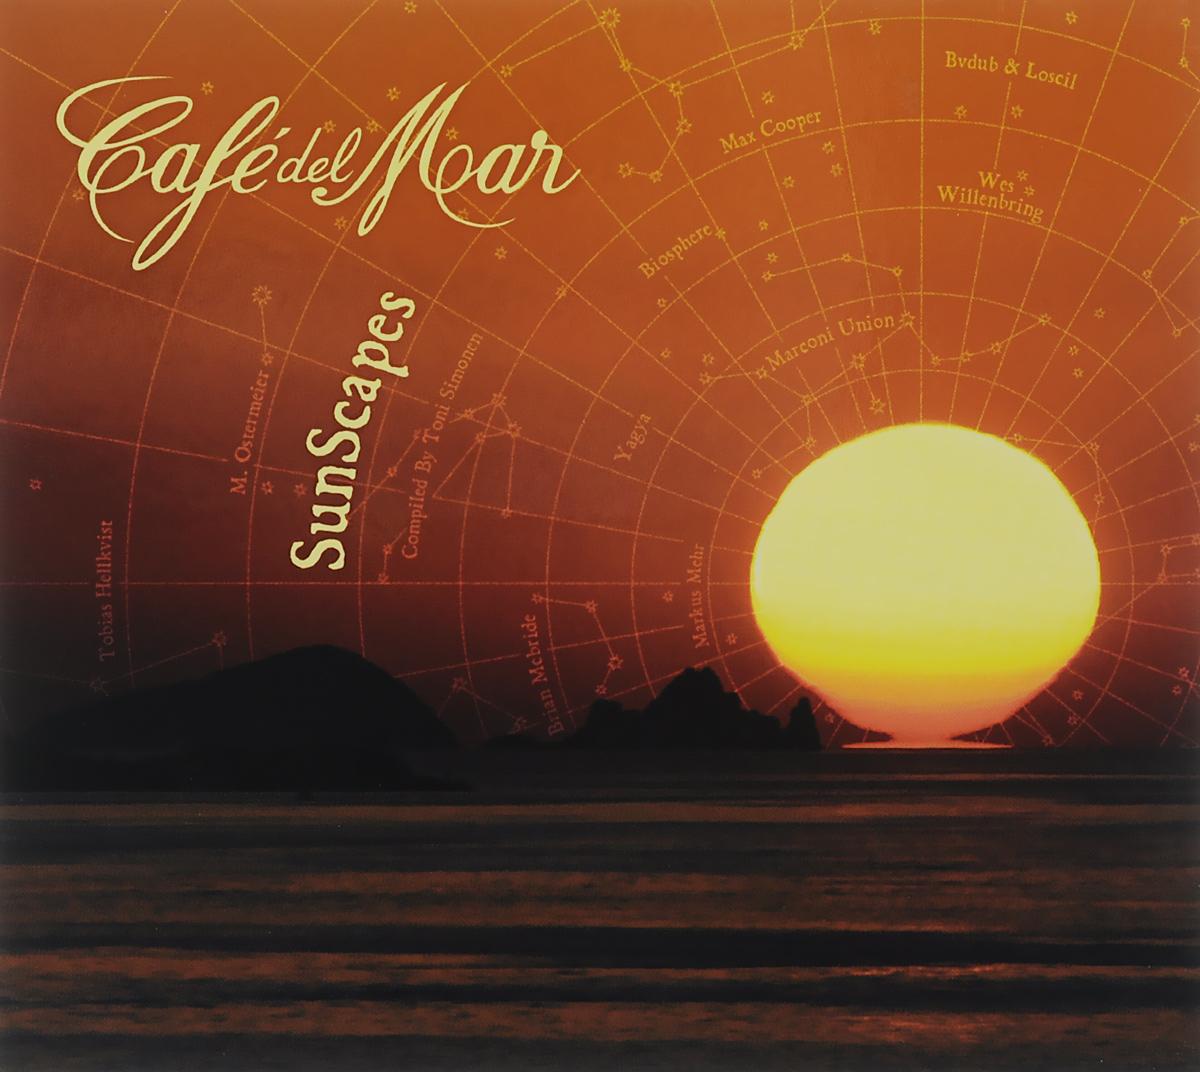 Cafe Del Mar. SunScapes 2015 Audio CD